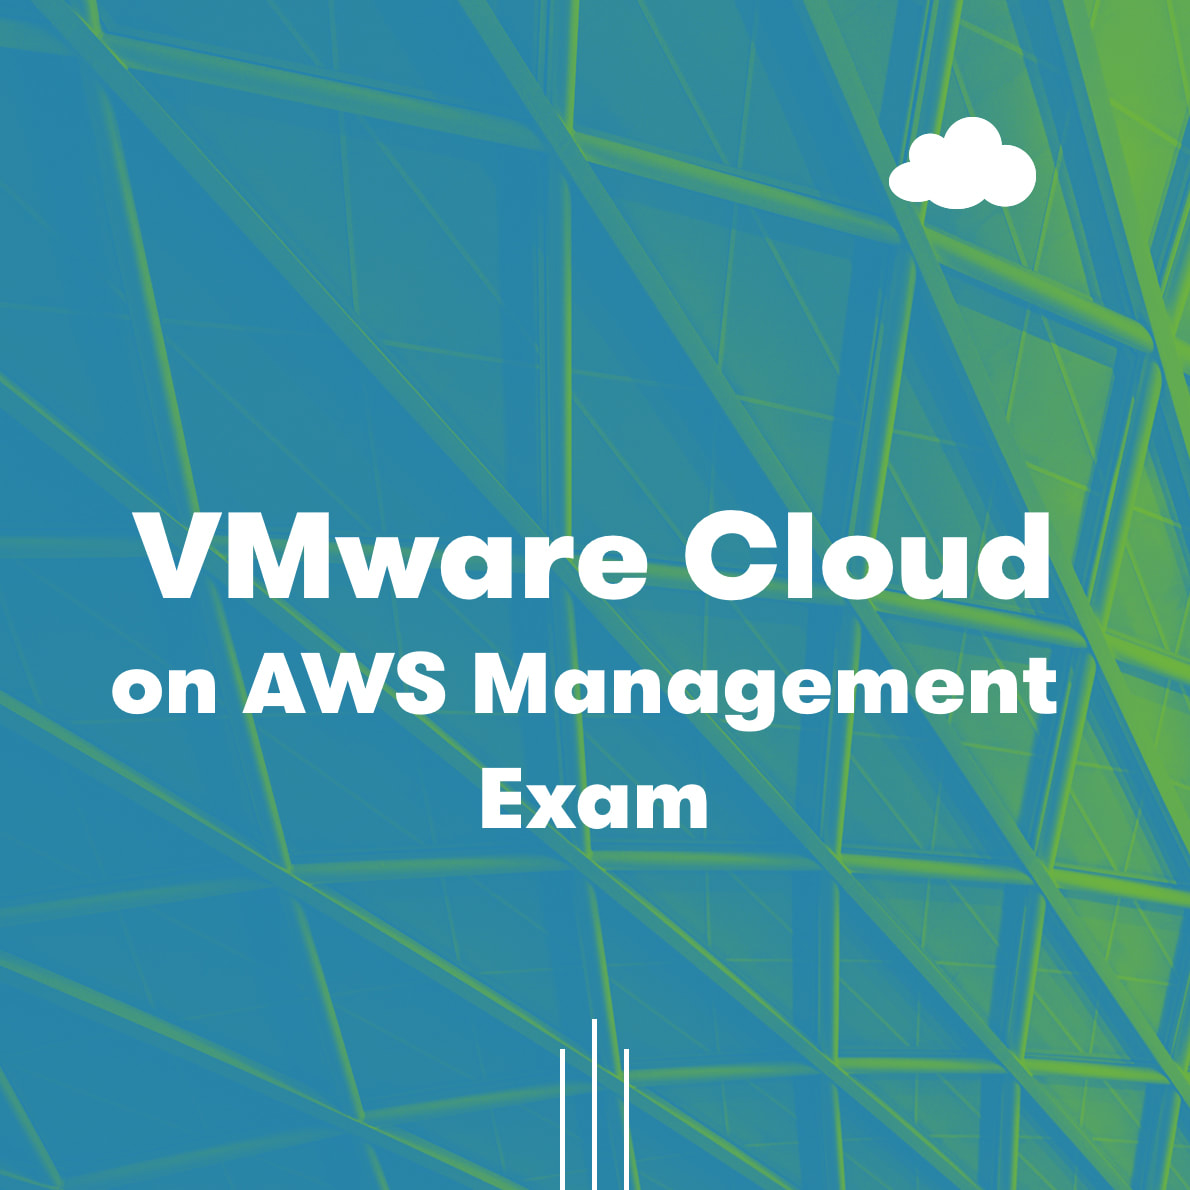 1589861931979-VMwareCloudonAWSManagementExamCover